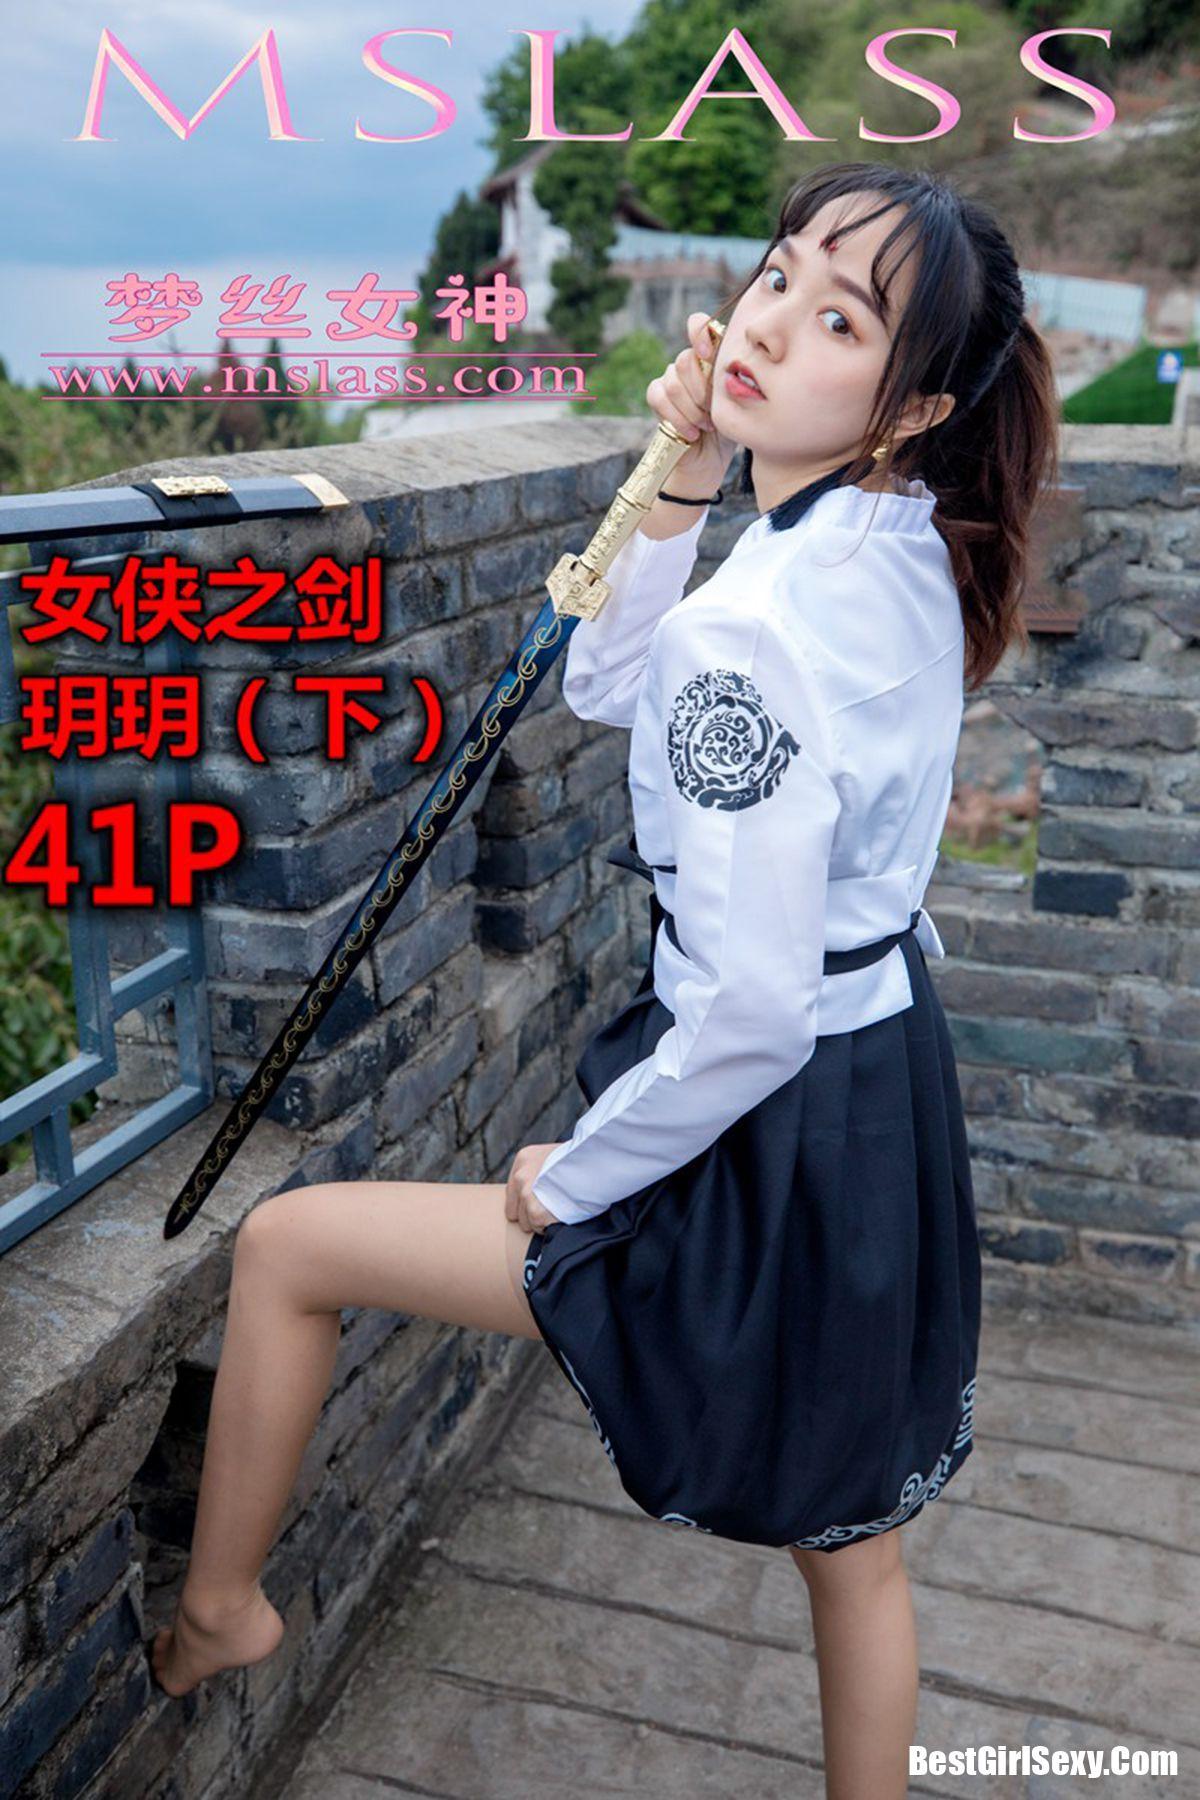 MSLASS梦丝女神 No.004 Yue Yue